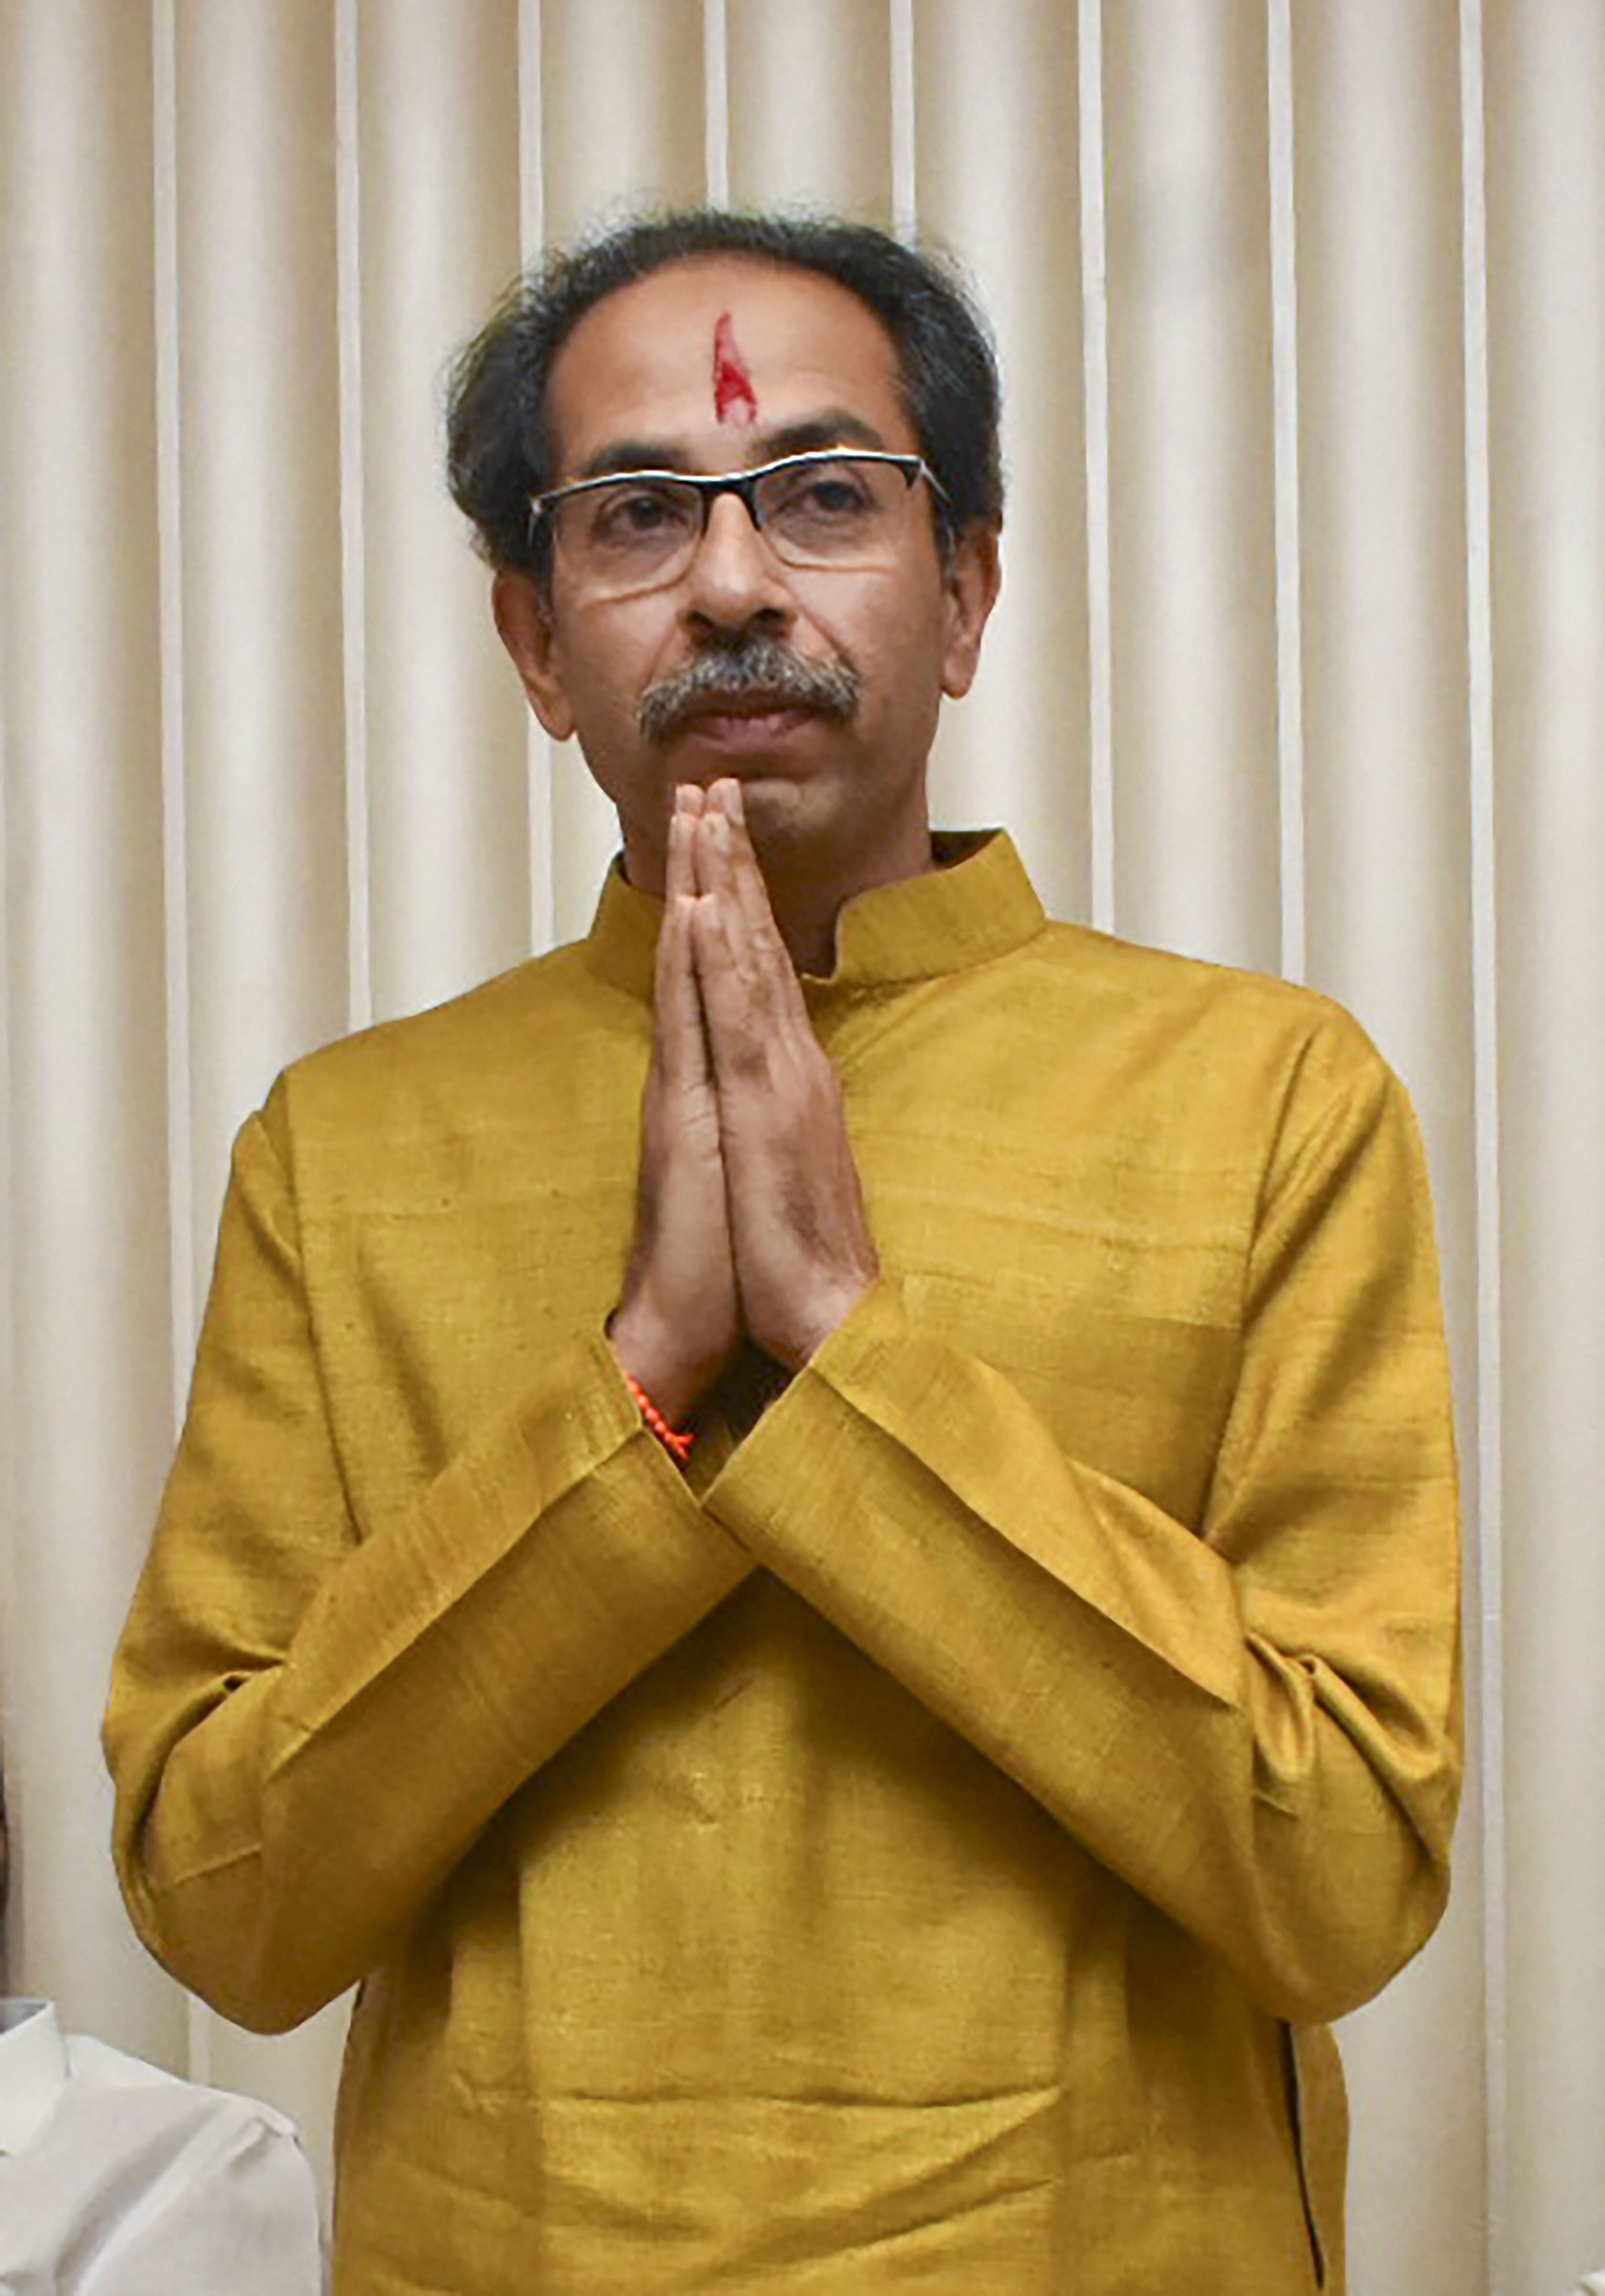 Uddhav Thackeray, 59, became the third Sena leader after Manohar Joshi and Narayan Rane to occupy the top post.